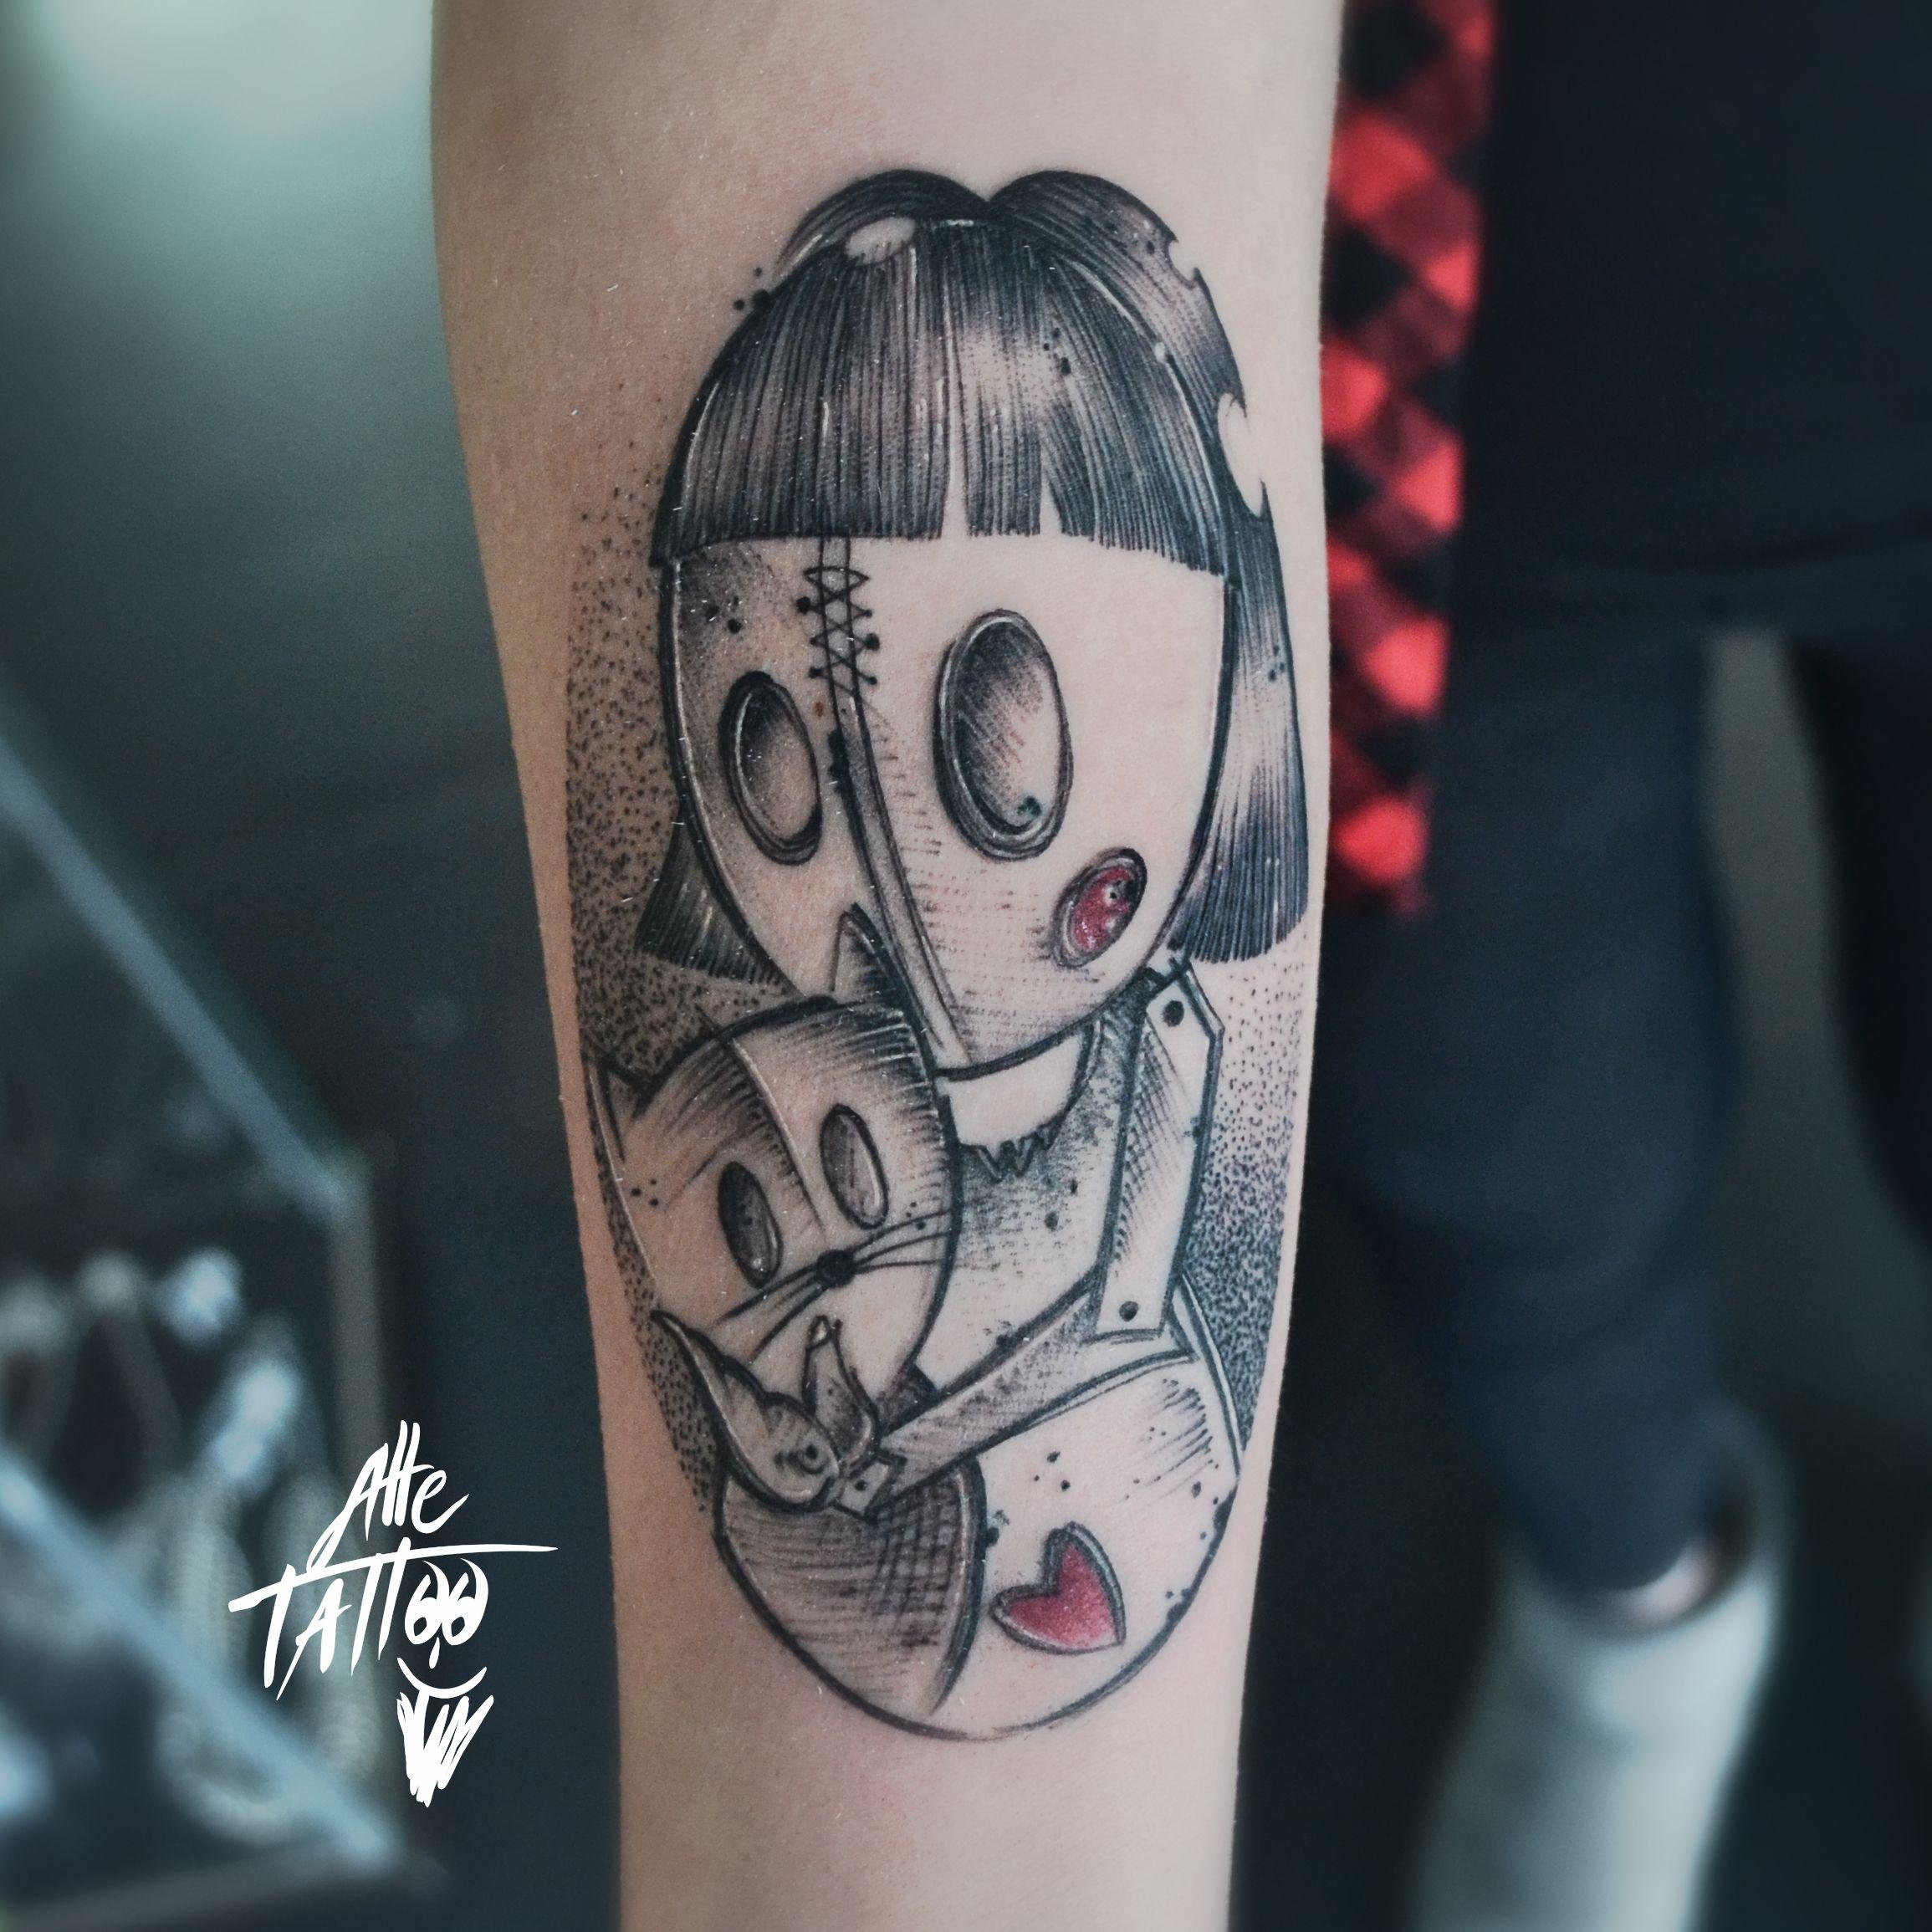 #alletattoo #doll #sketh #bambolina #cat #pet #dotwork #tattoo #tatuaggio